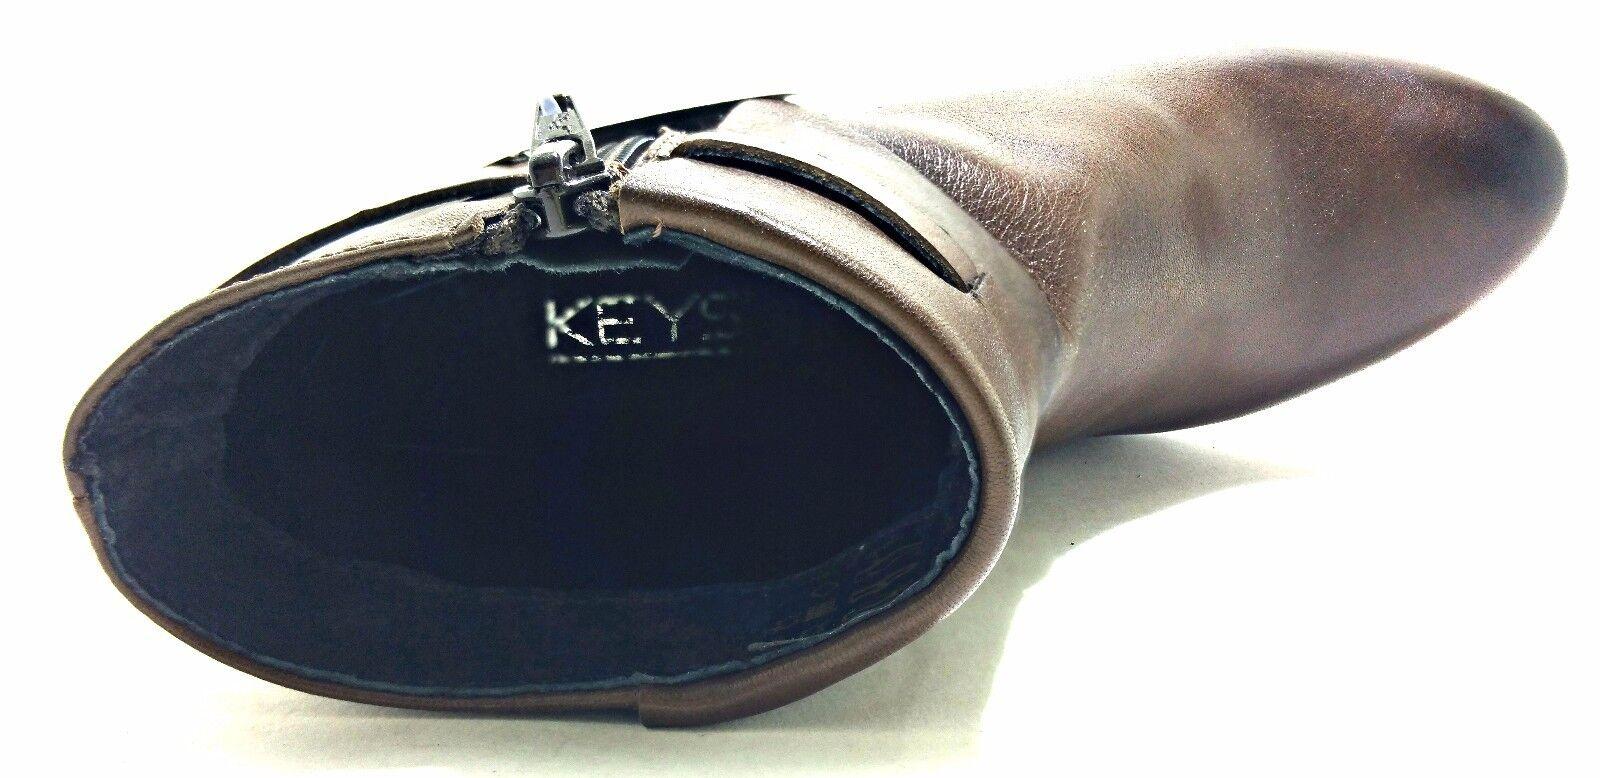 KEYS 1153 PELLE CAFFE scarpe scarpe scarpe donna tronchetti stivali stivaletti tacco zeppa c7f757